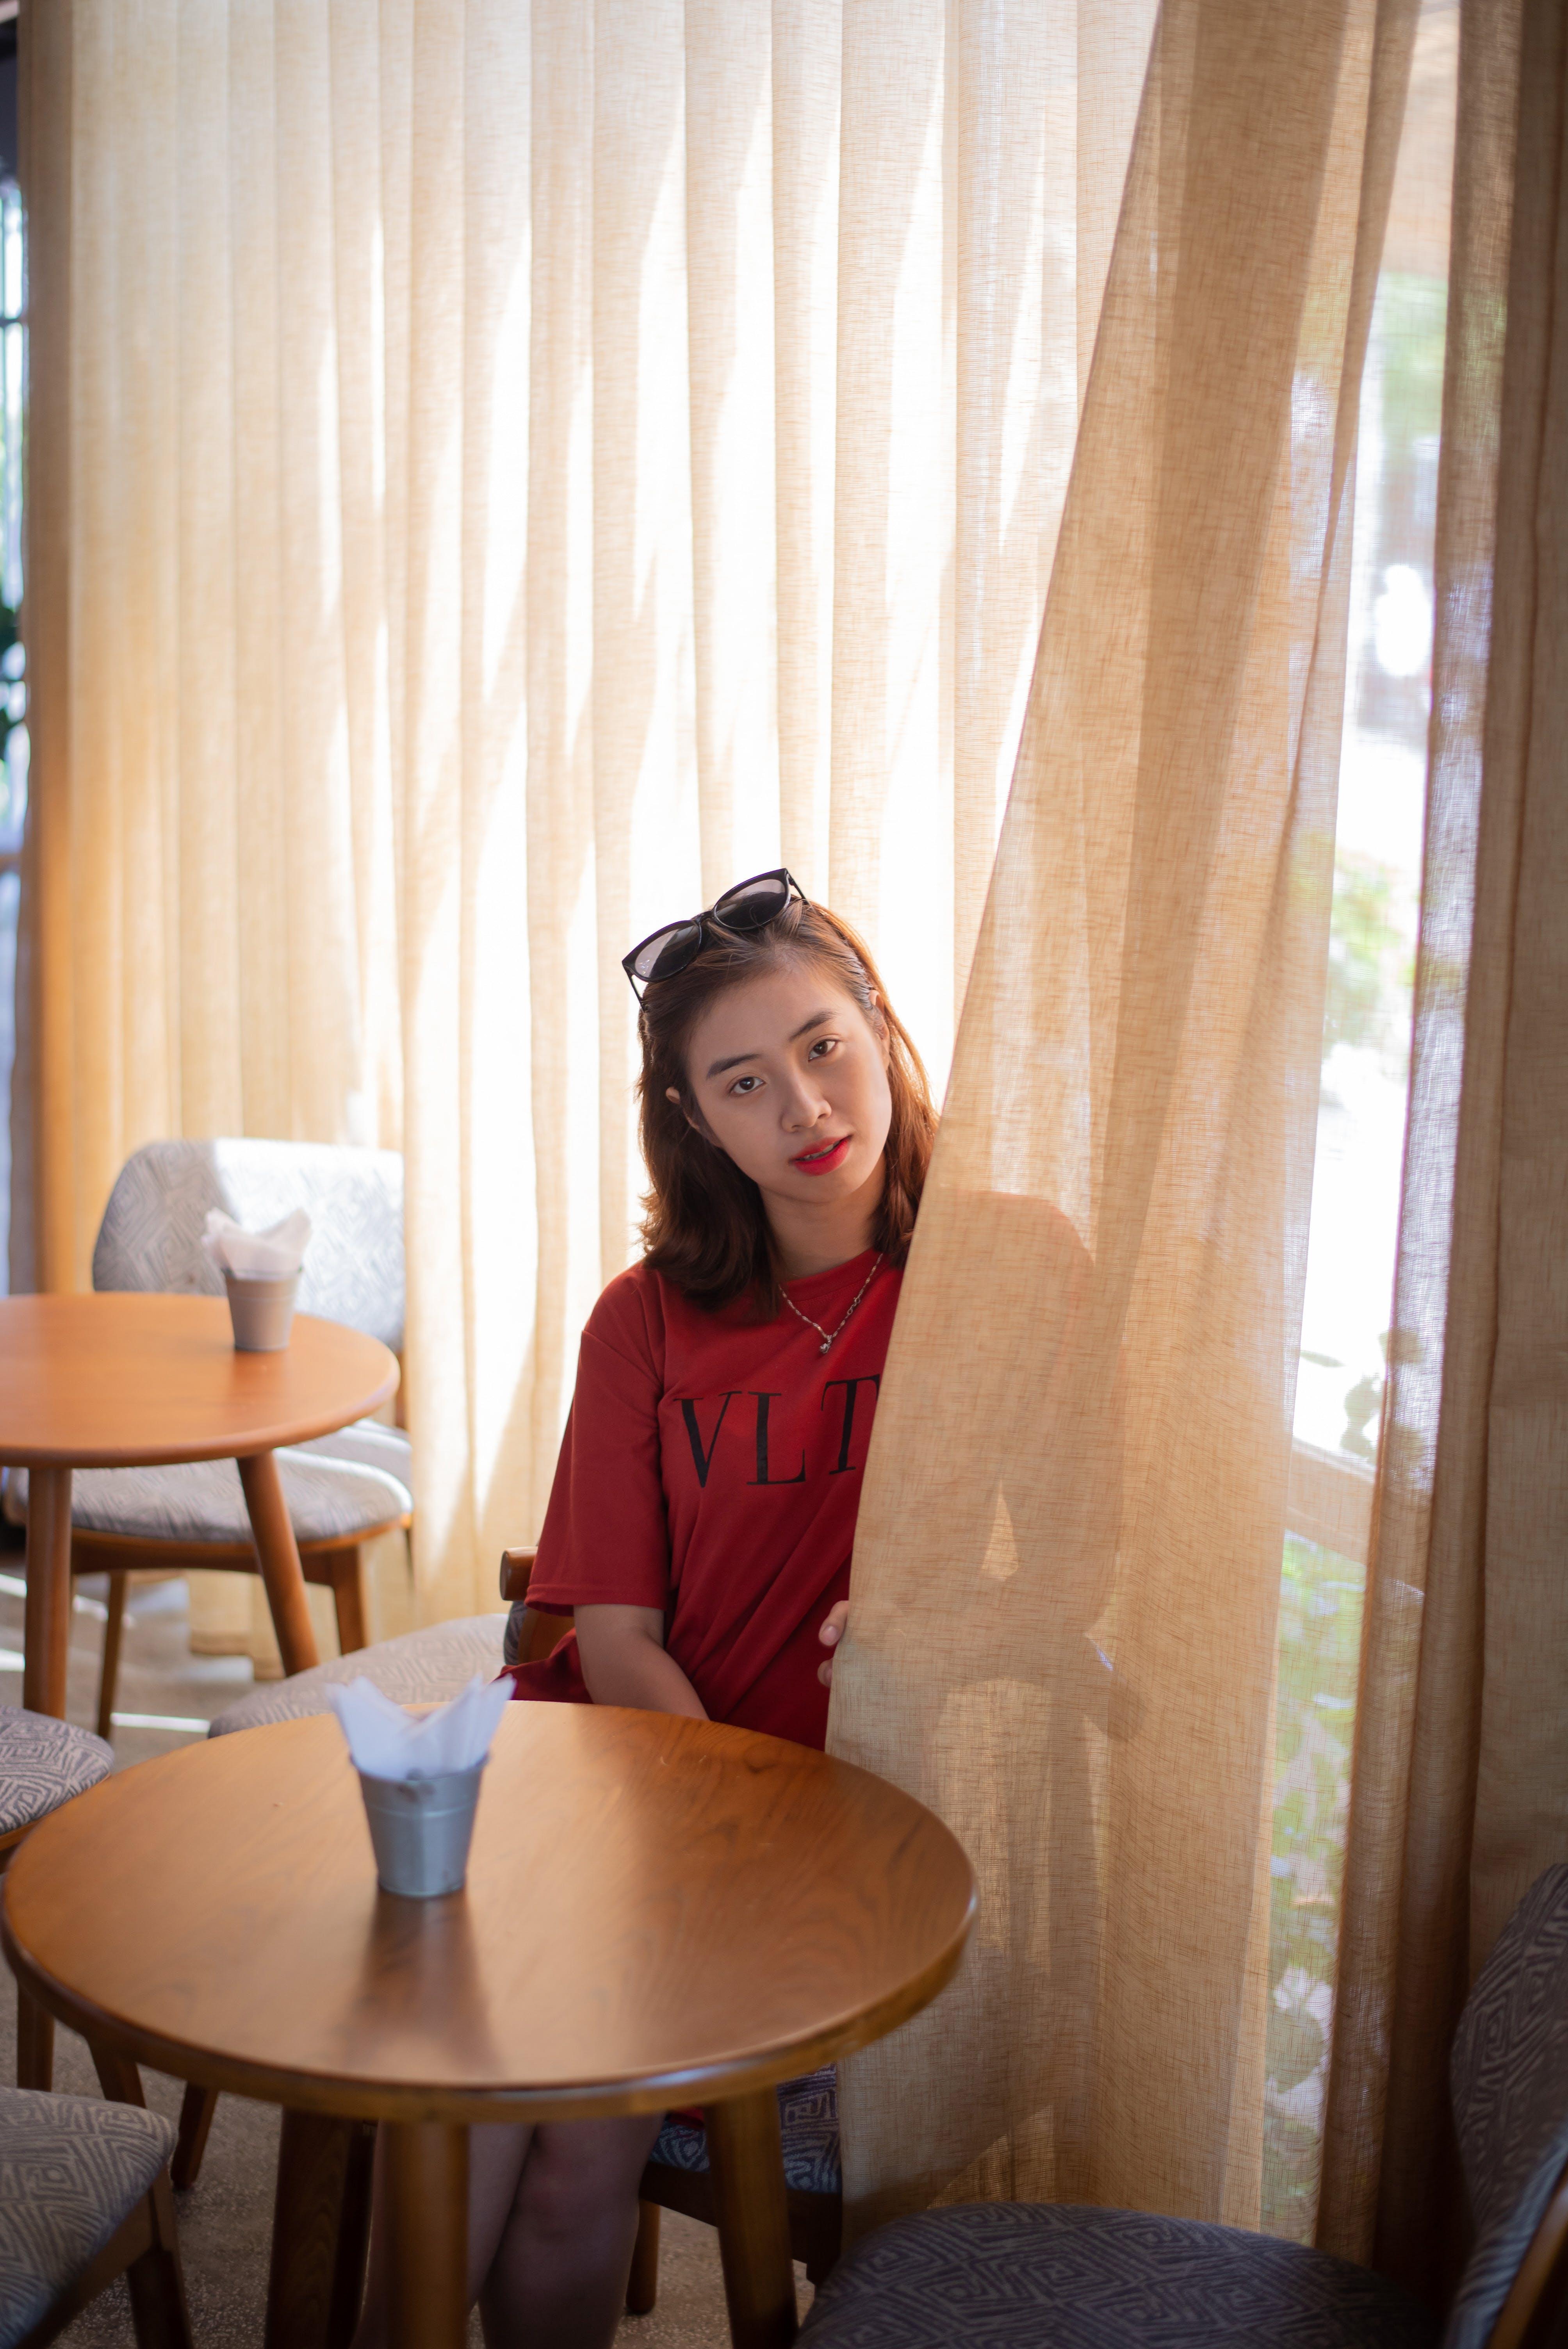 Woman Sitting Behind Curtain